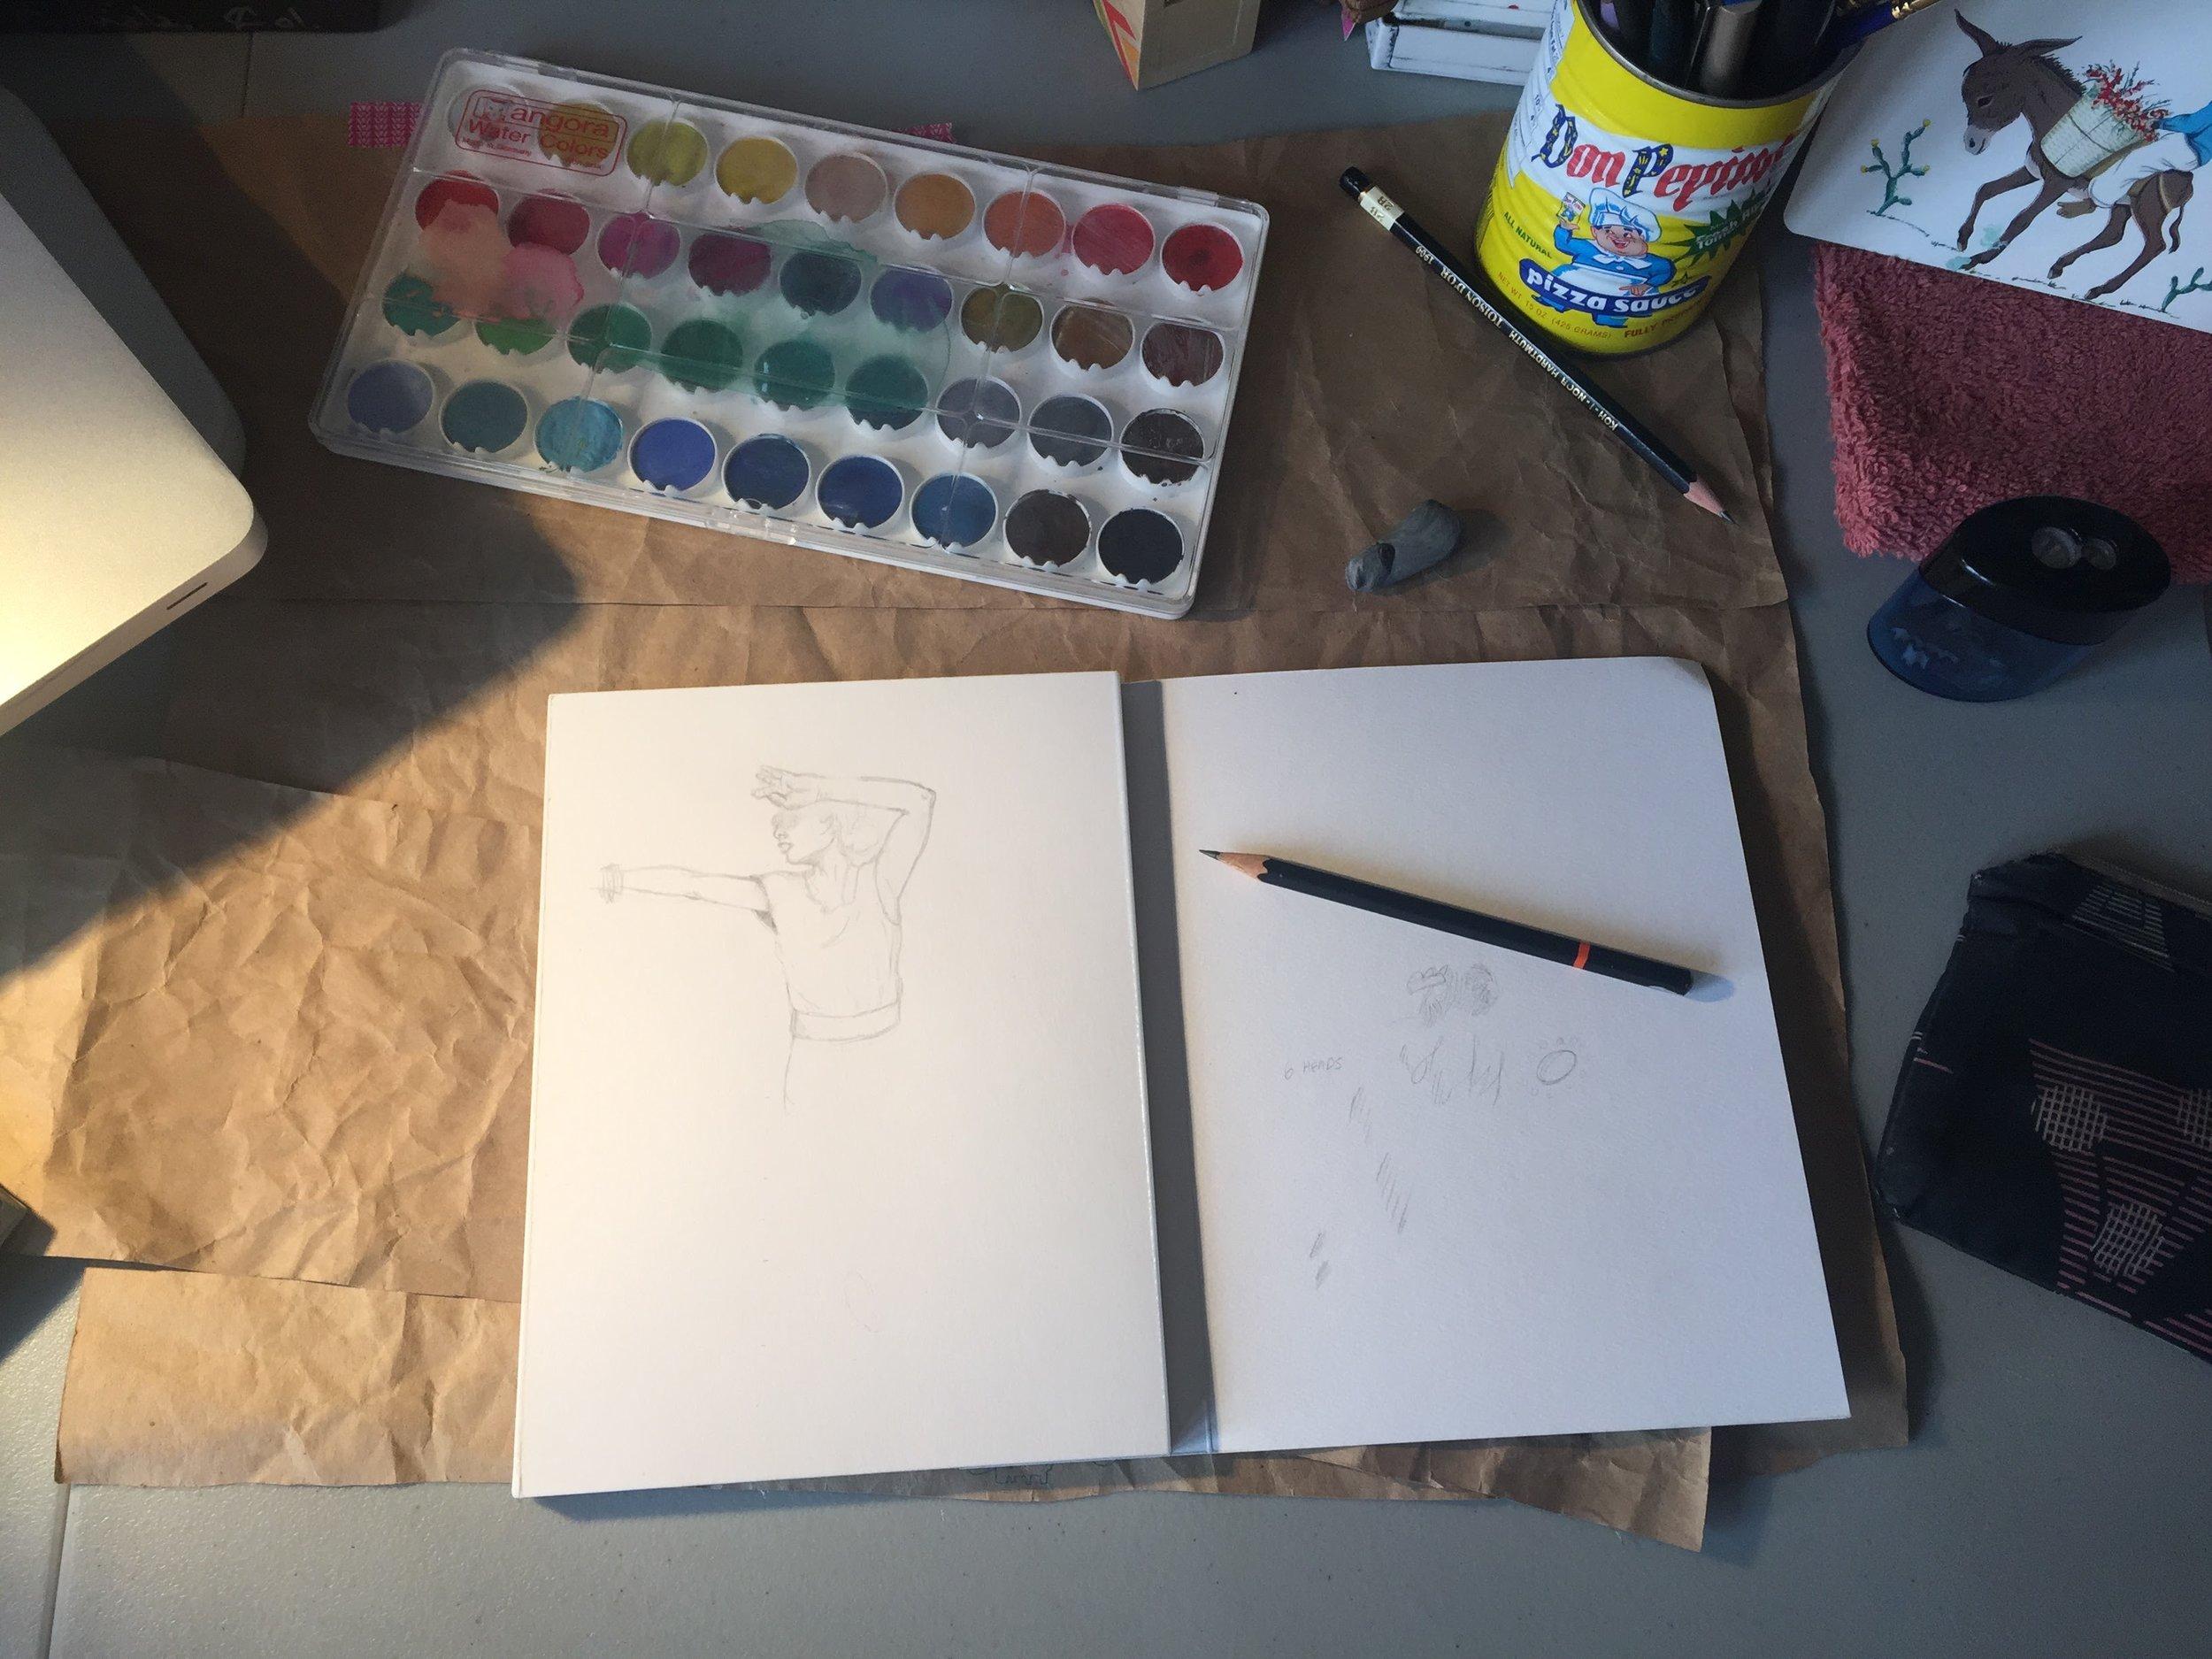 edelweiss-cardenas-a-drawing-a-day-172-1.jpg